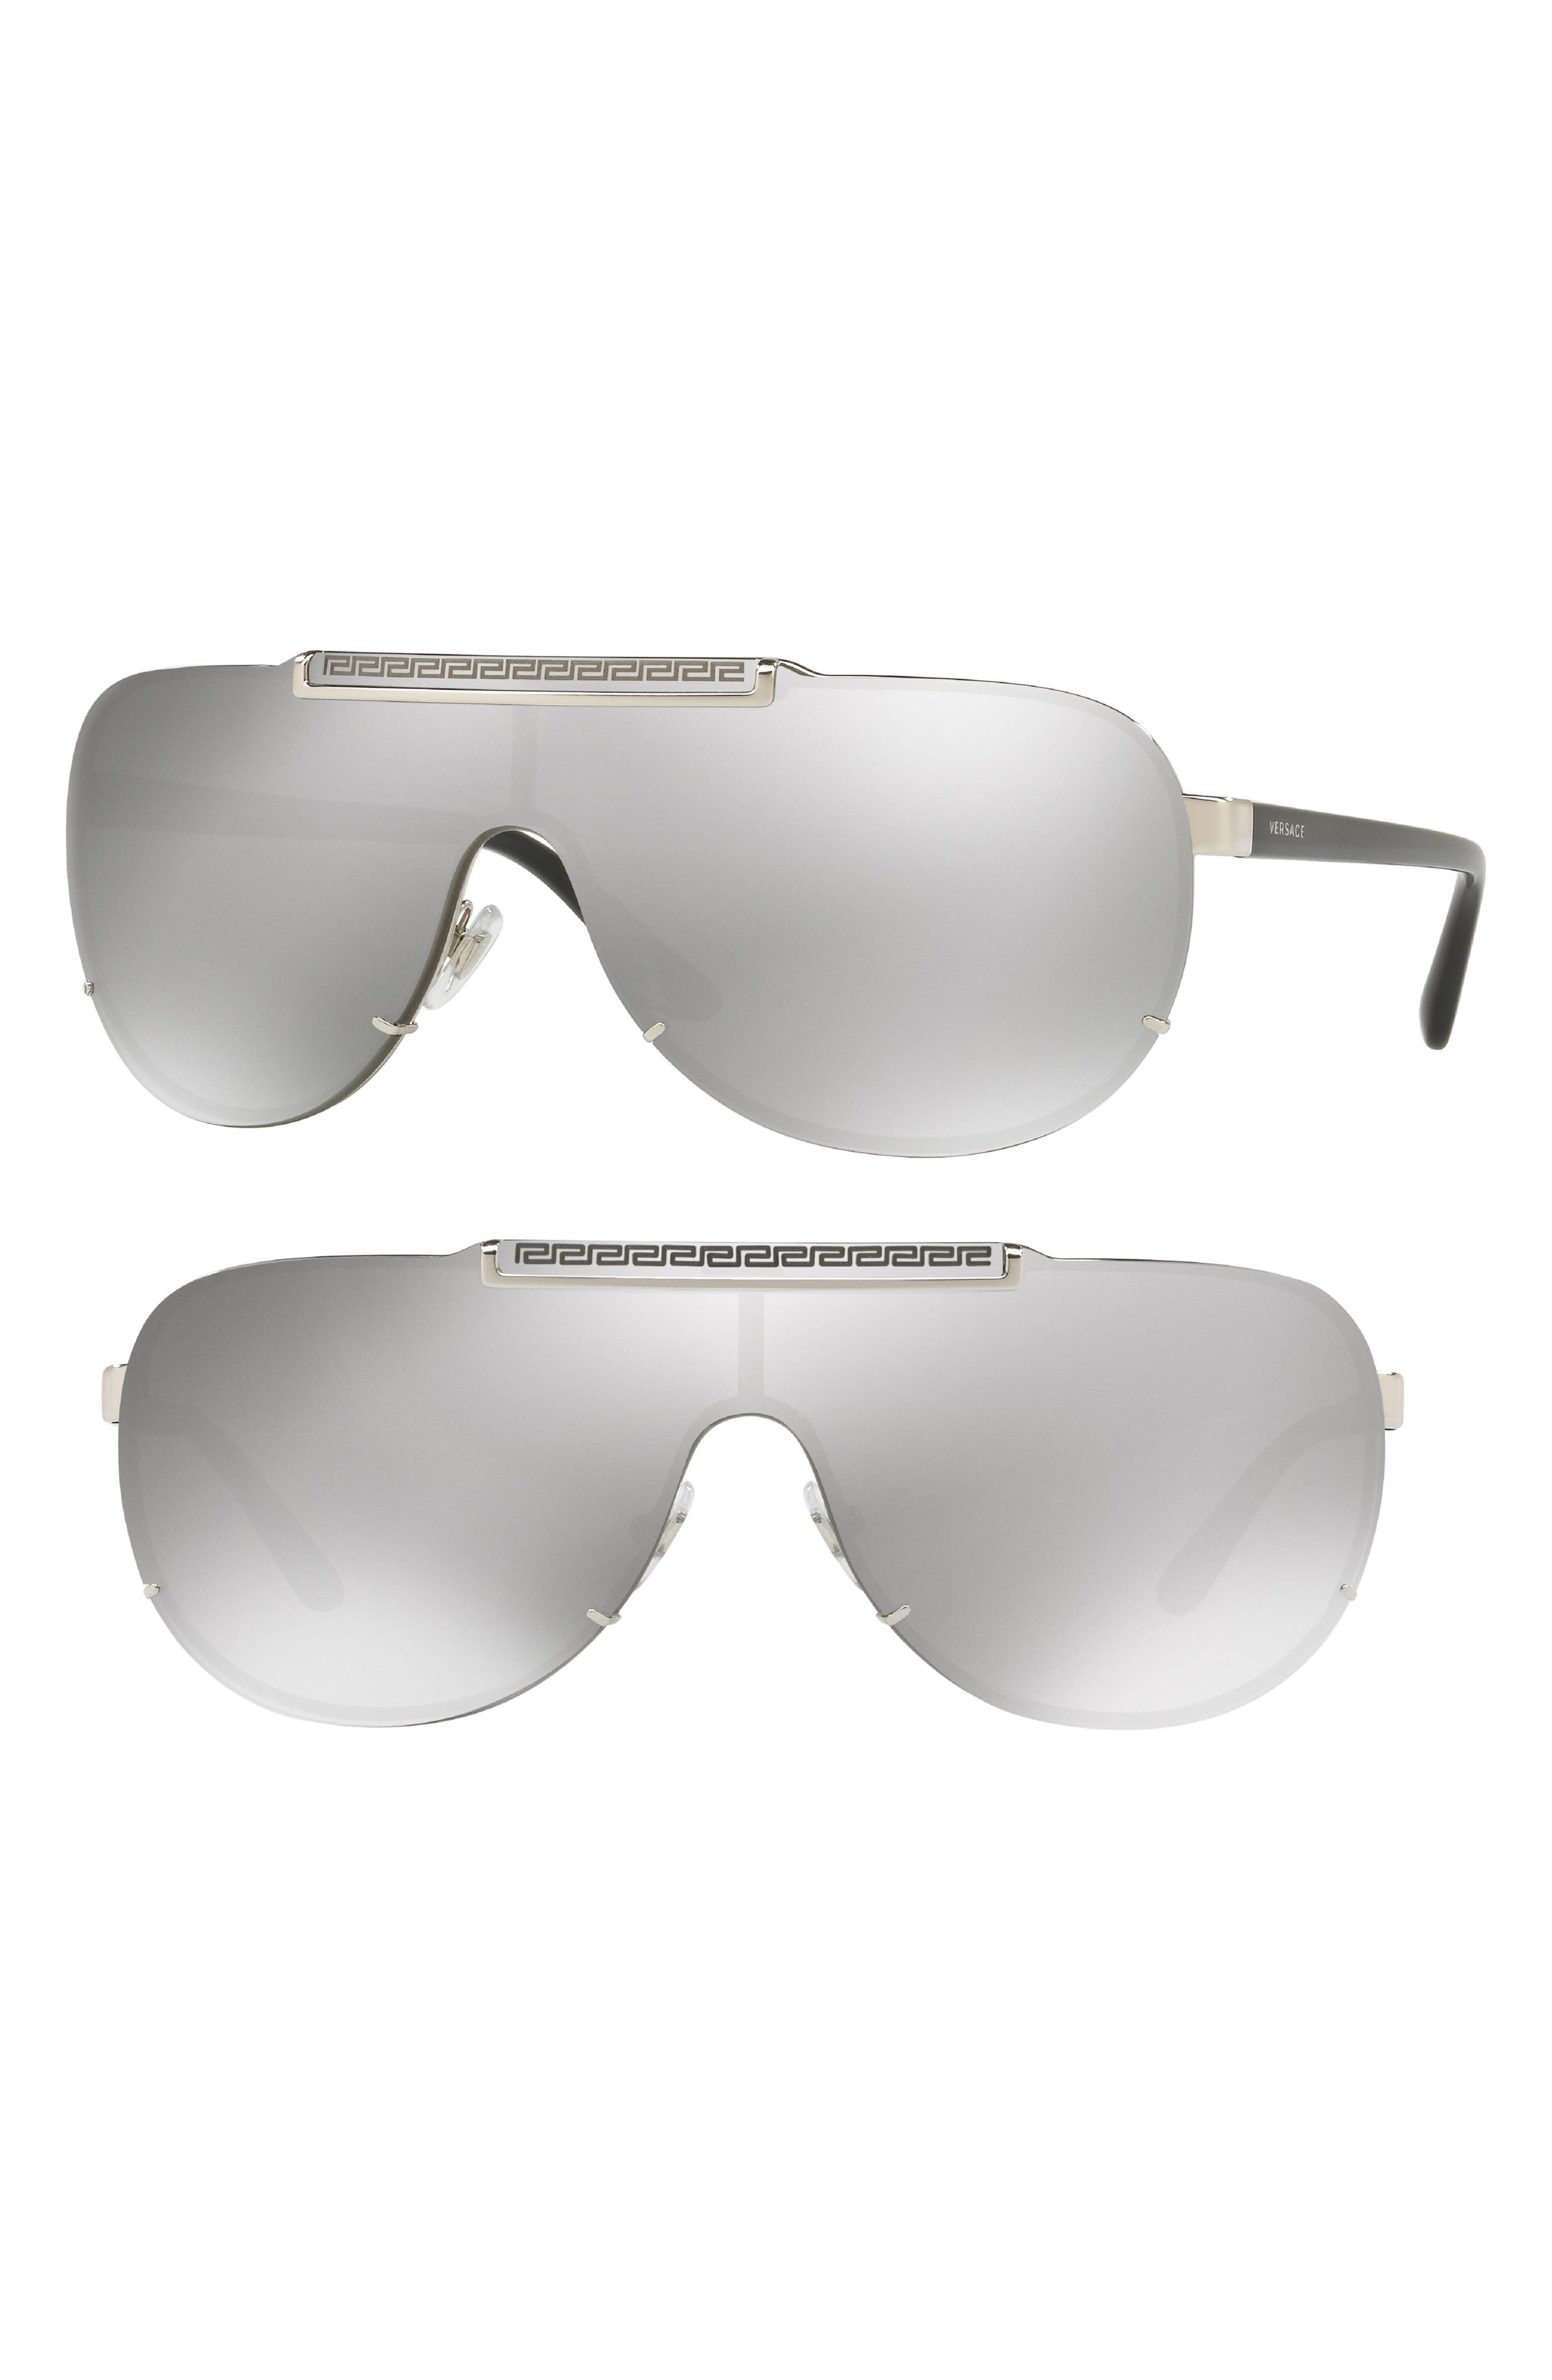 40mm Shield Sunglasses,                         Main,                         color,